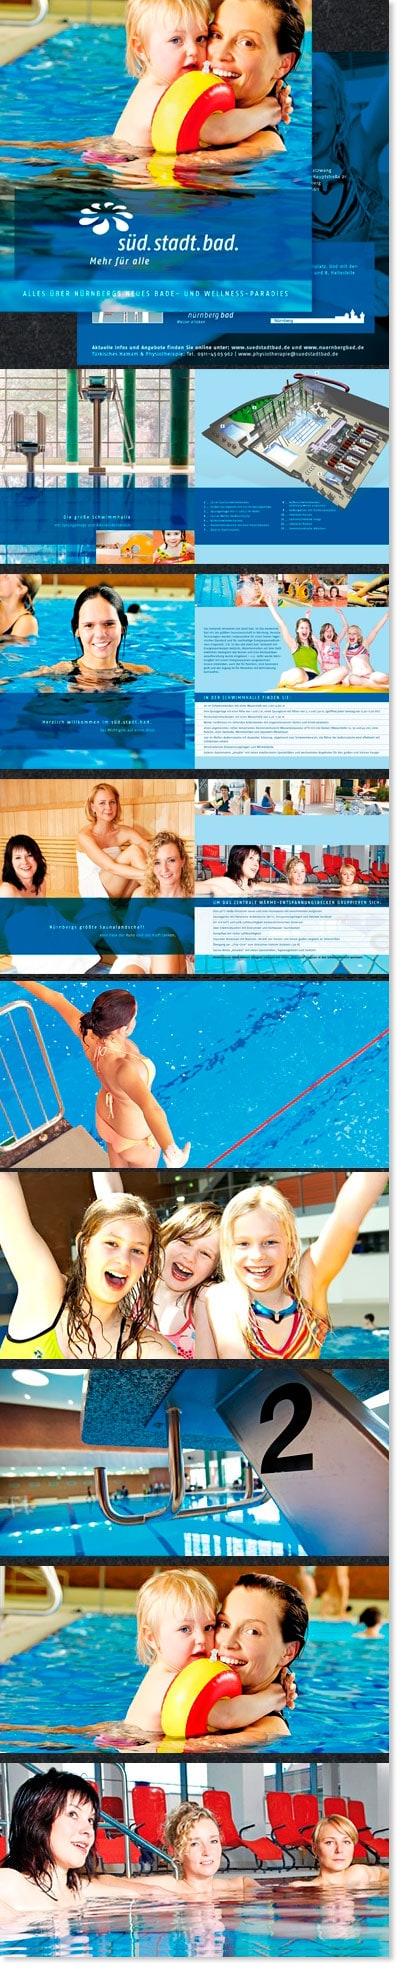 Editorial Fotografie für süd.stadt.bad. / Stadt Nürnberg